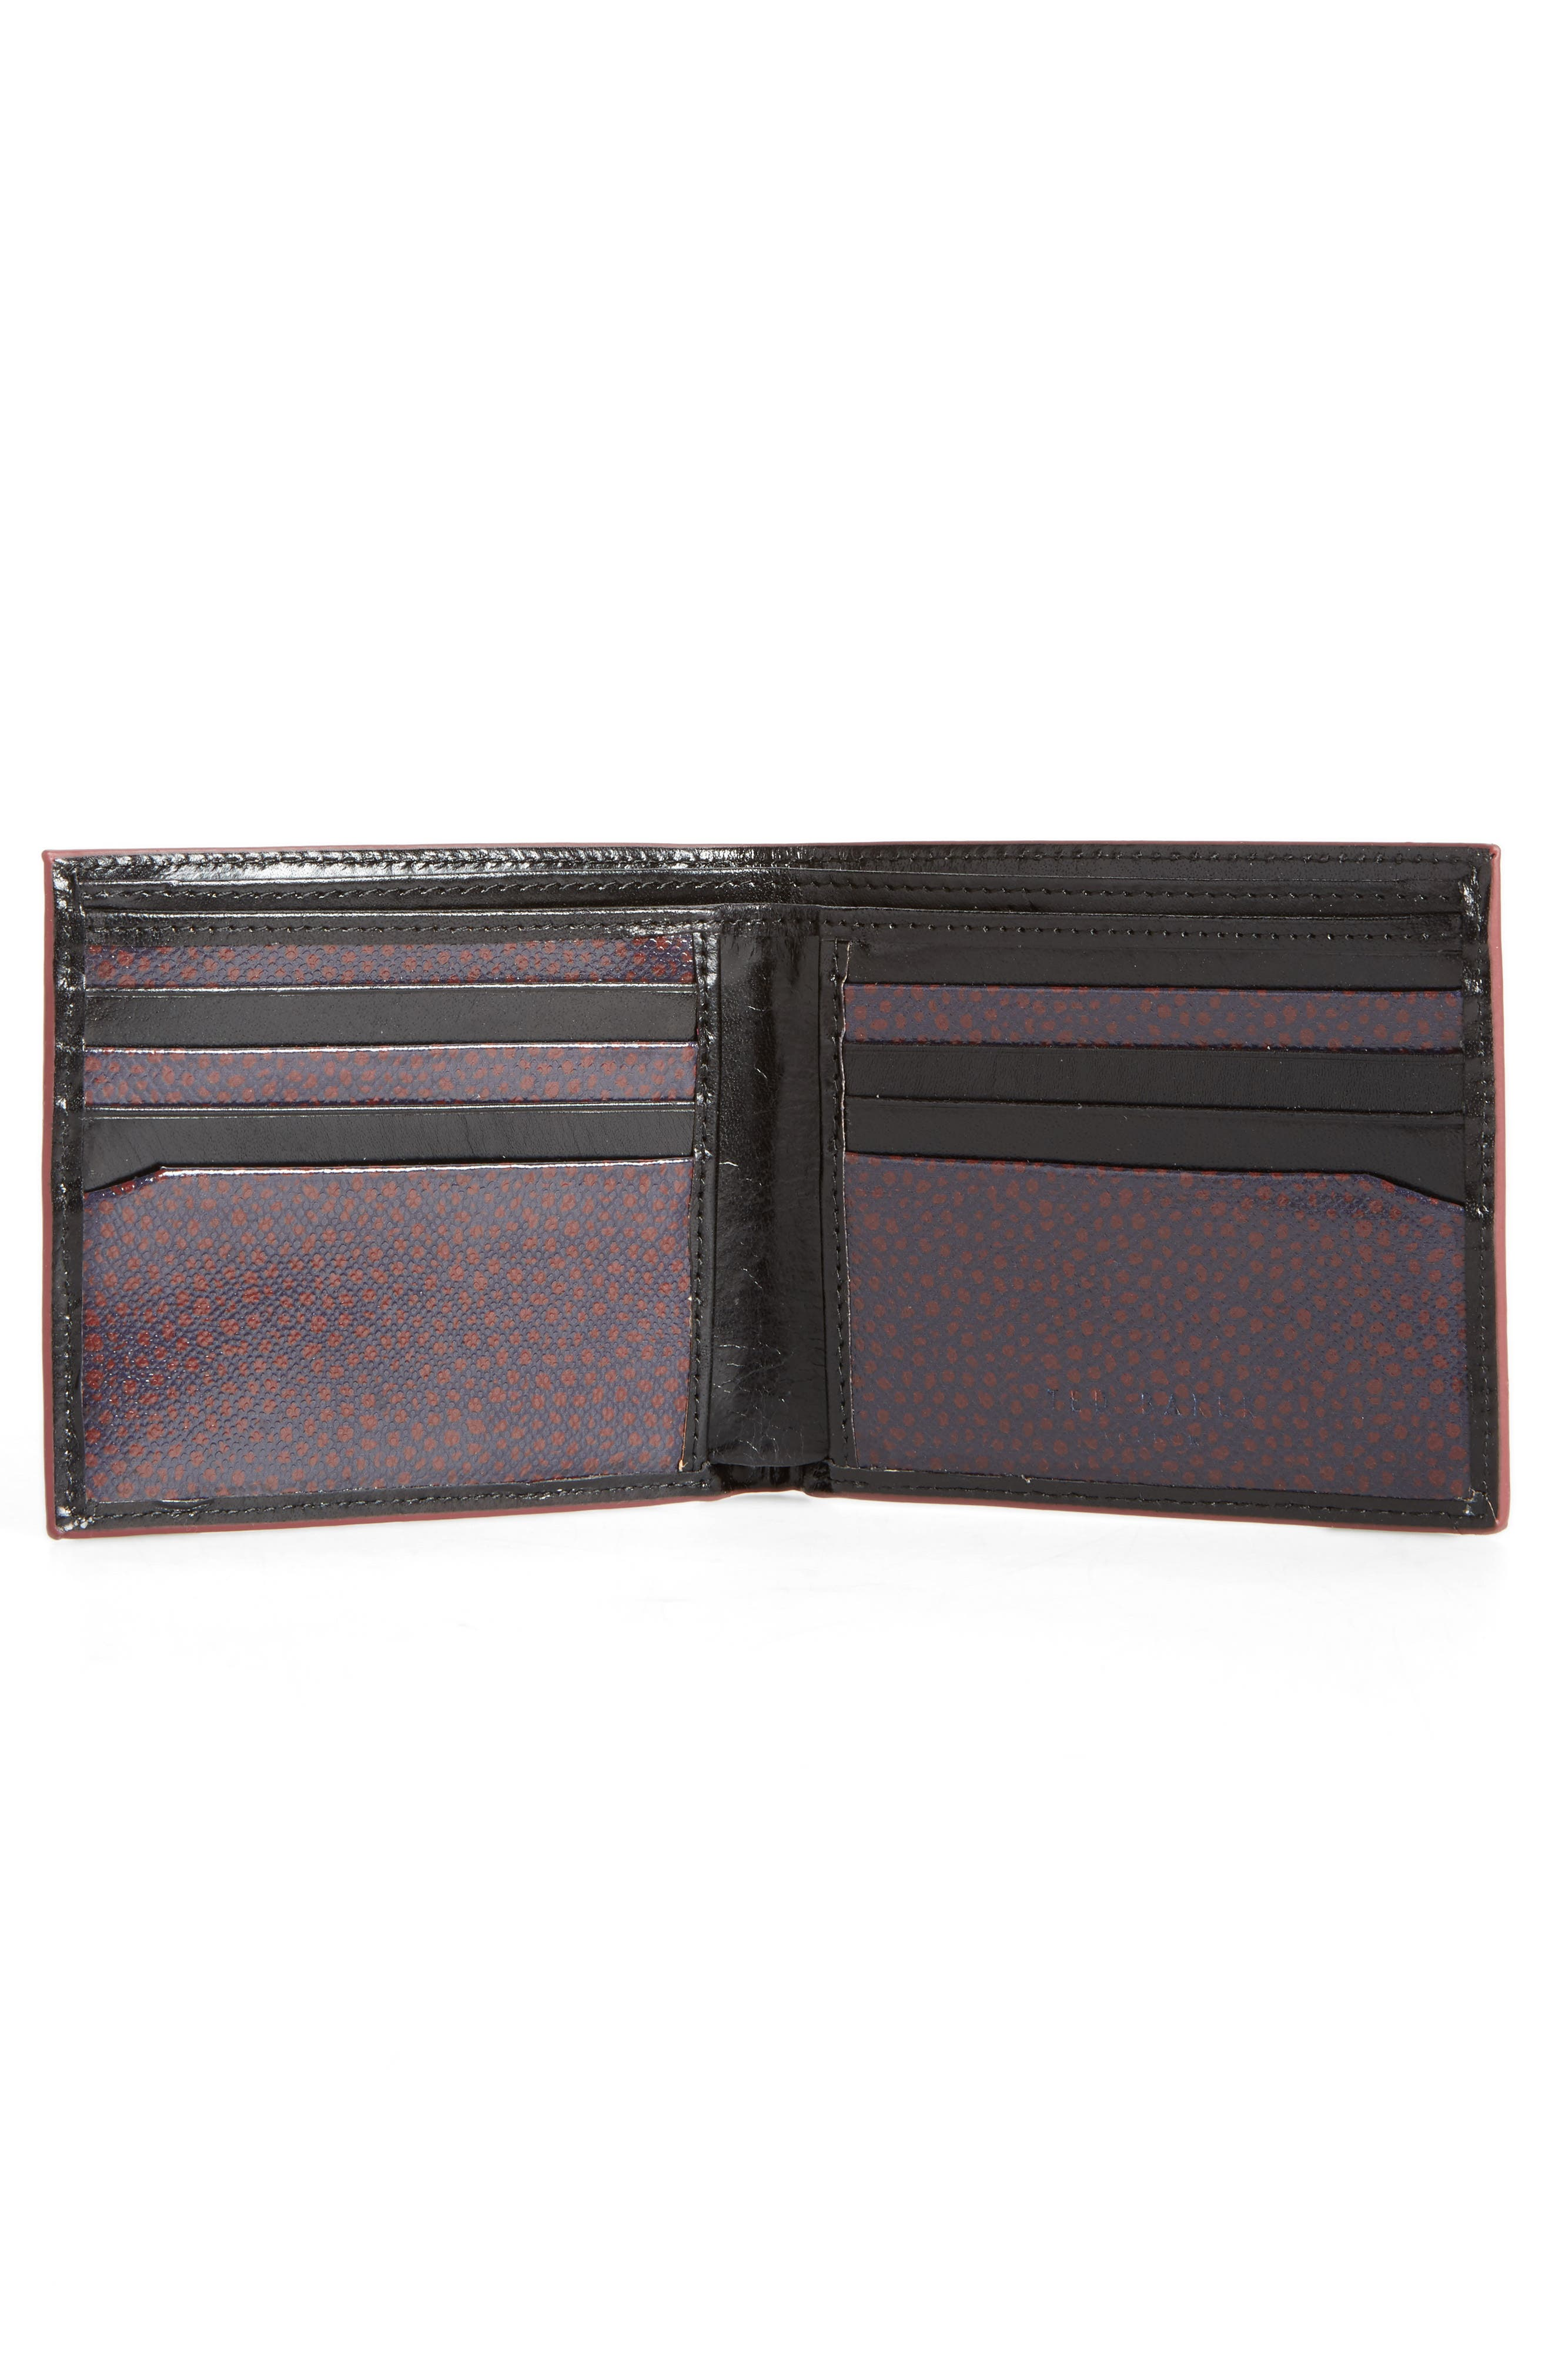 Loganz Leather Wallet,                             Alternate thumbnail 2, color,                             Black